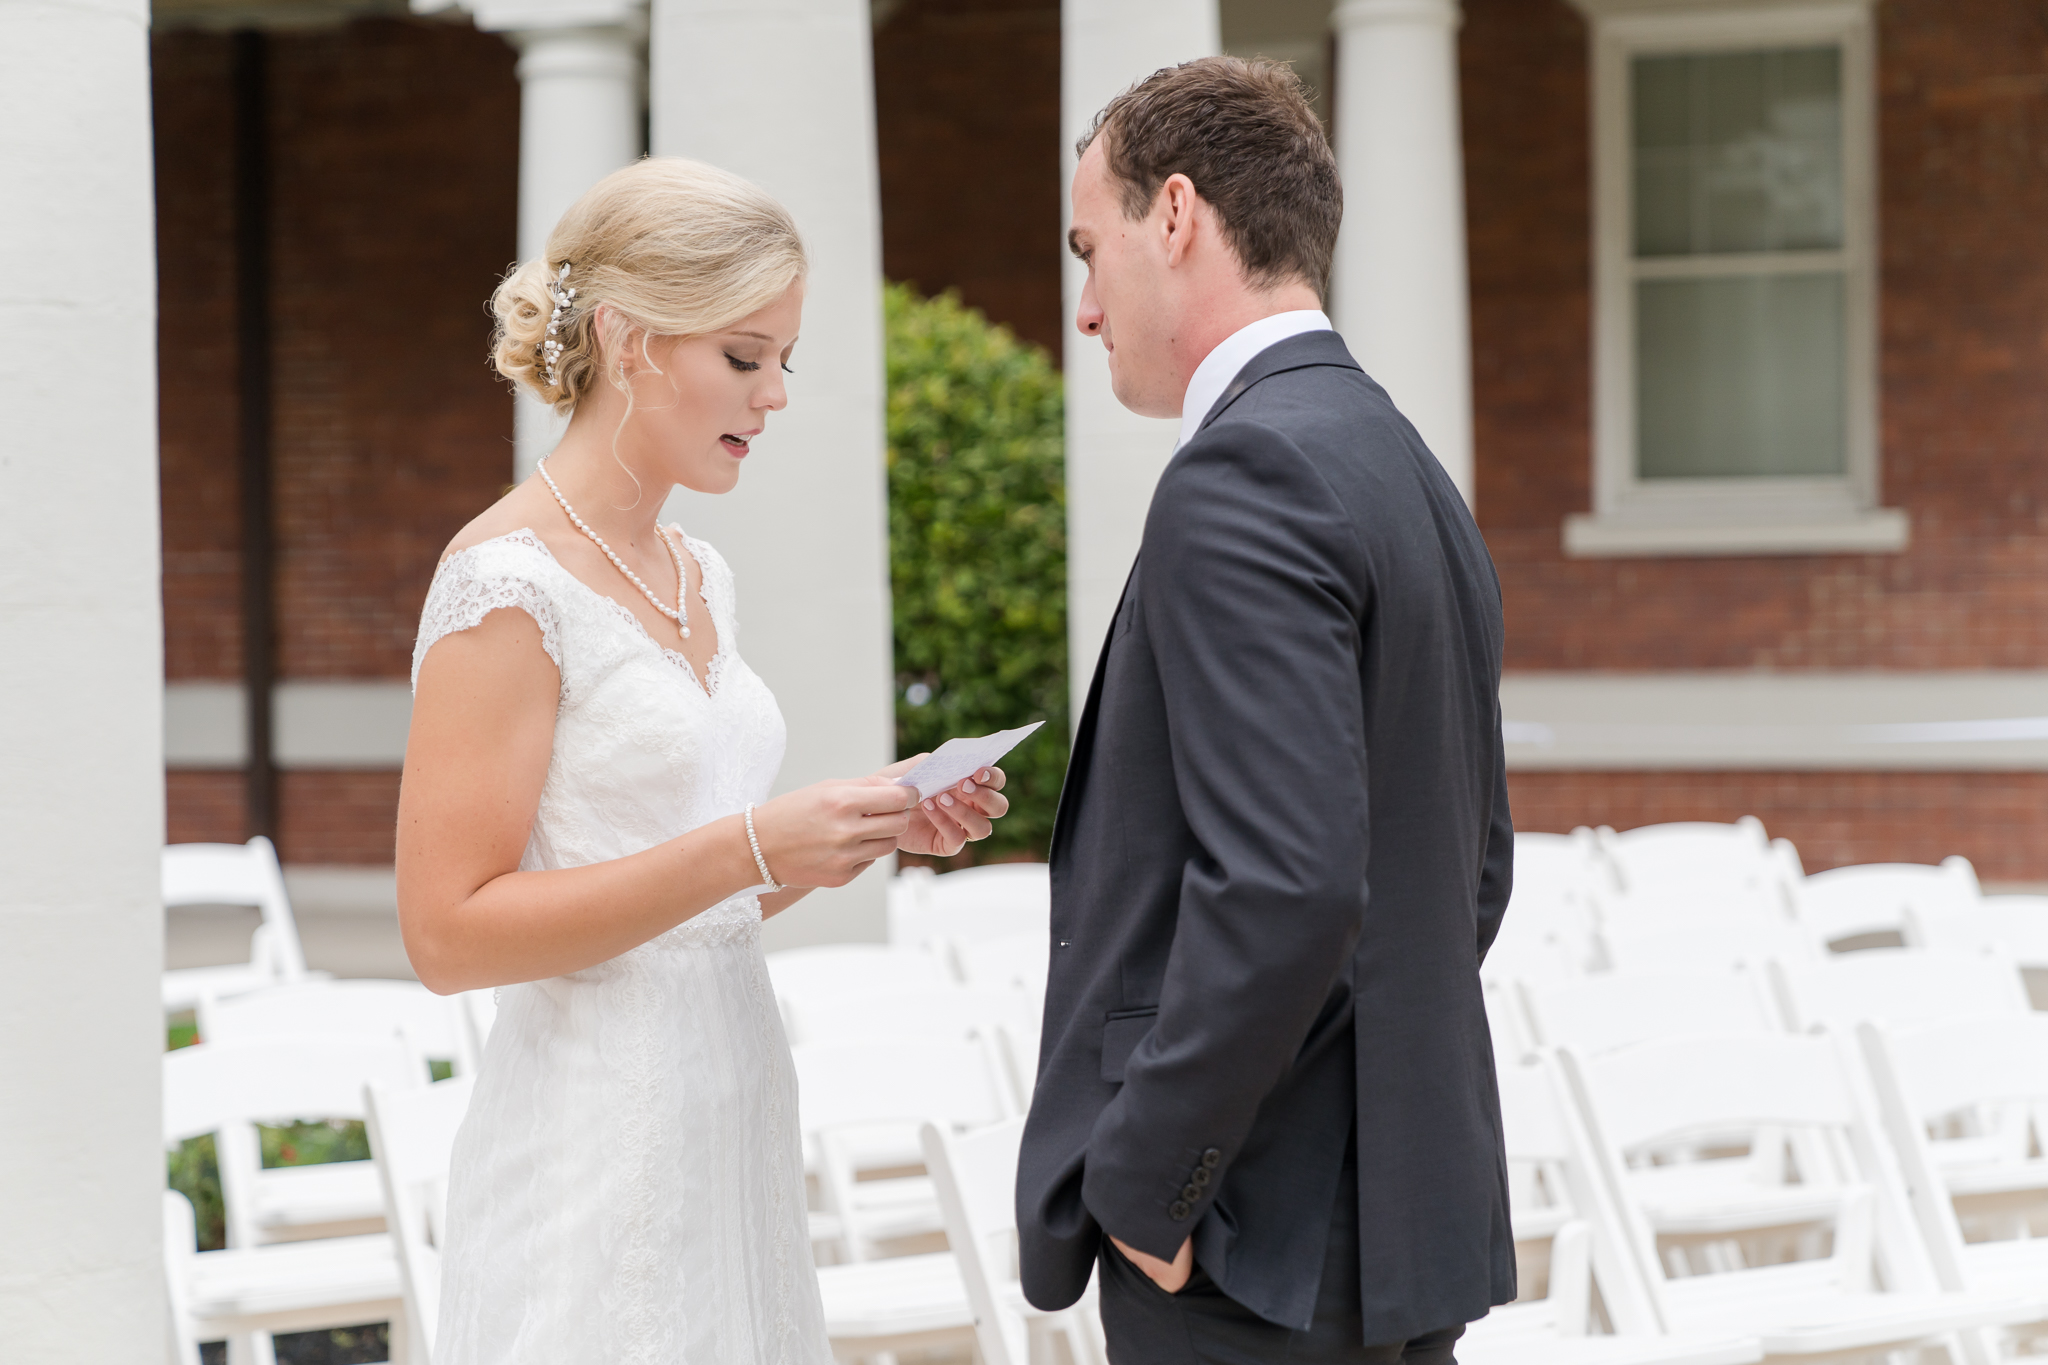 Westminister Hall Wedding Winona Lake Indiana06915.jpg